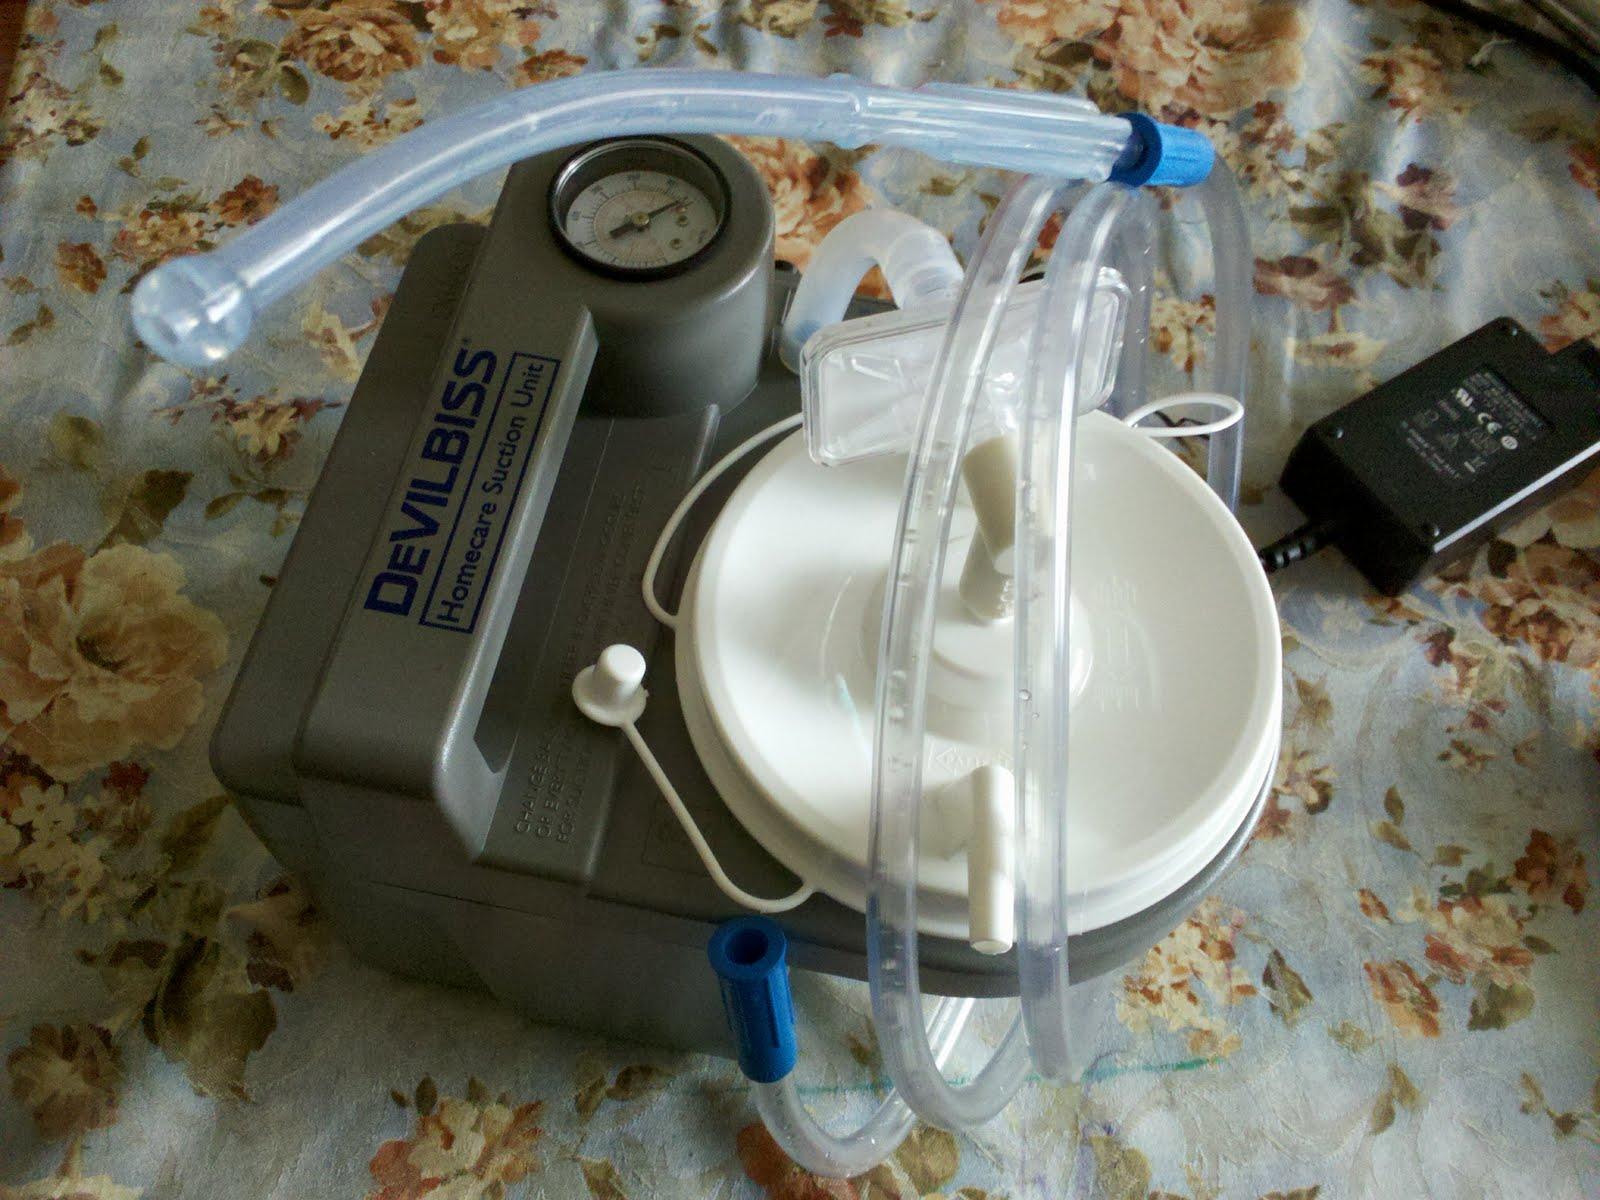 suction machine for saliva